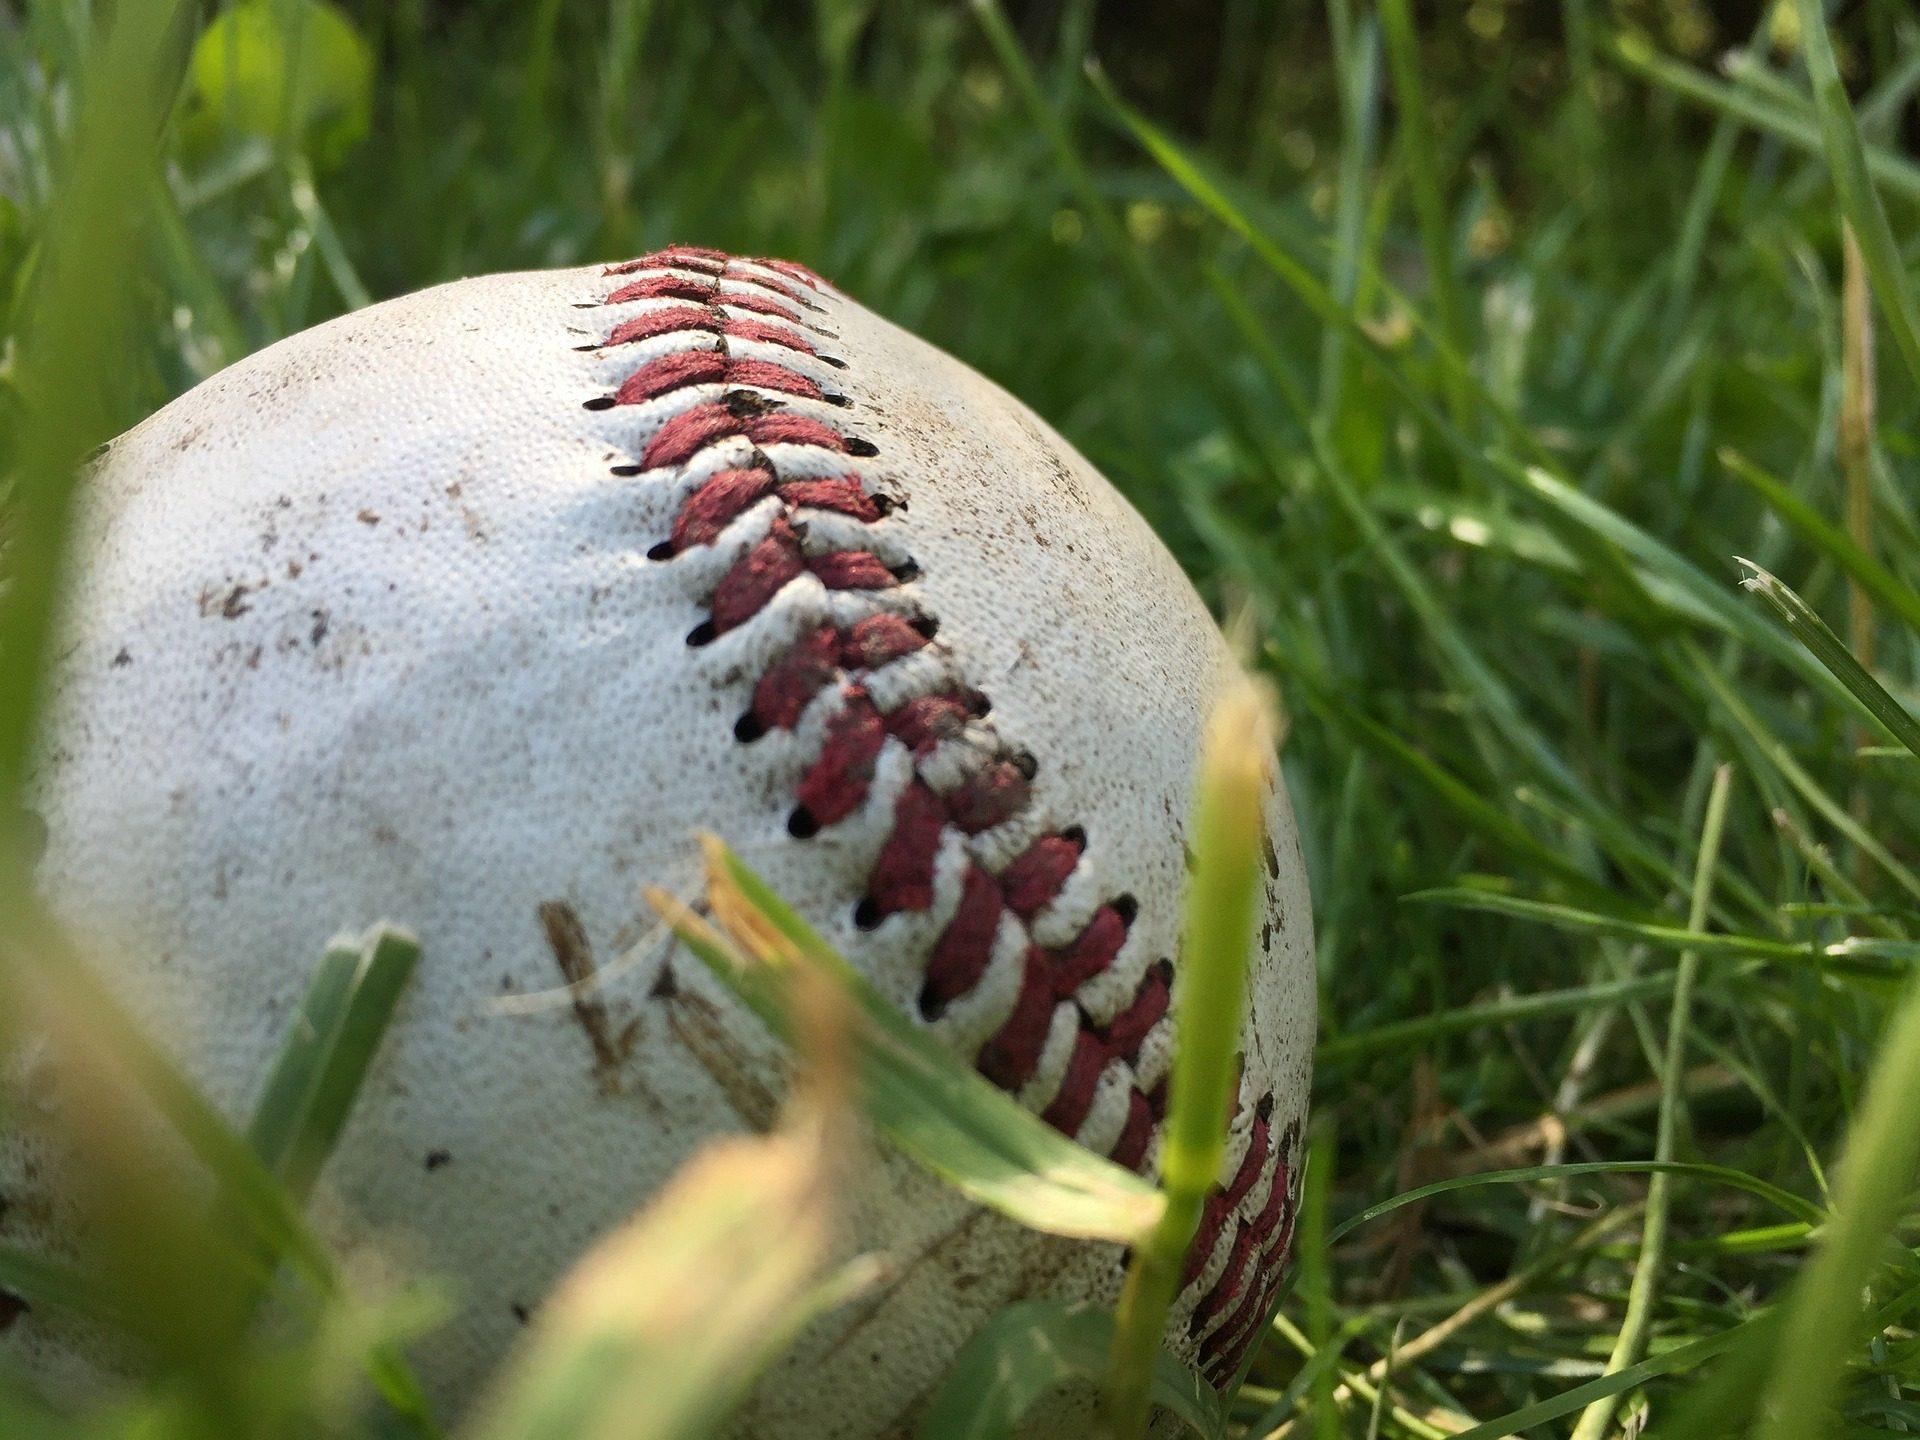 bola, bola, Basebol, solo, grama, campo - Papéis de parede HD - Professor-falken.com